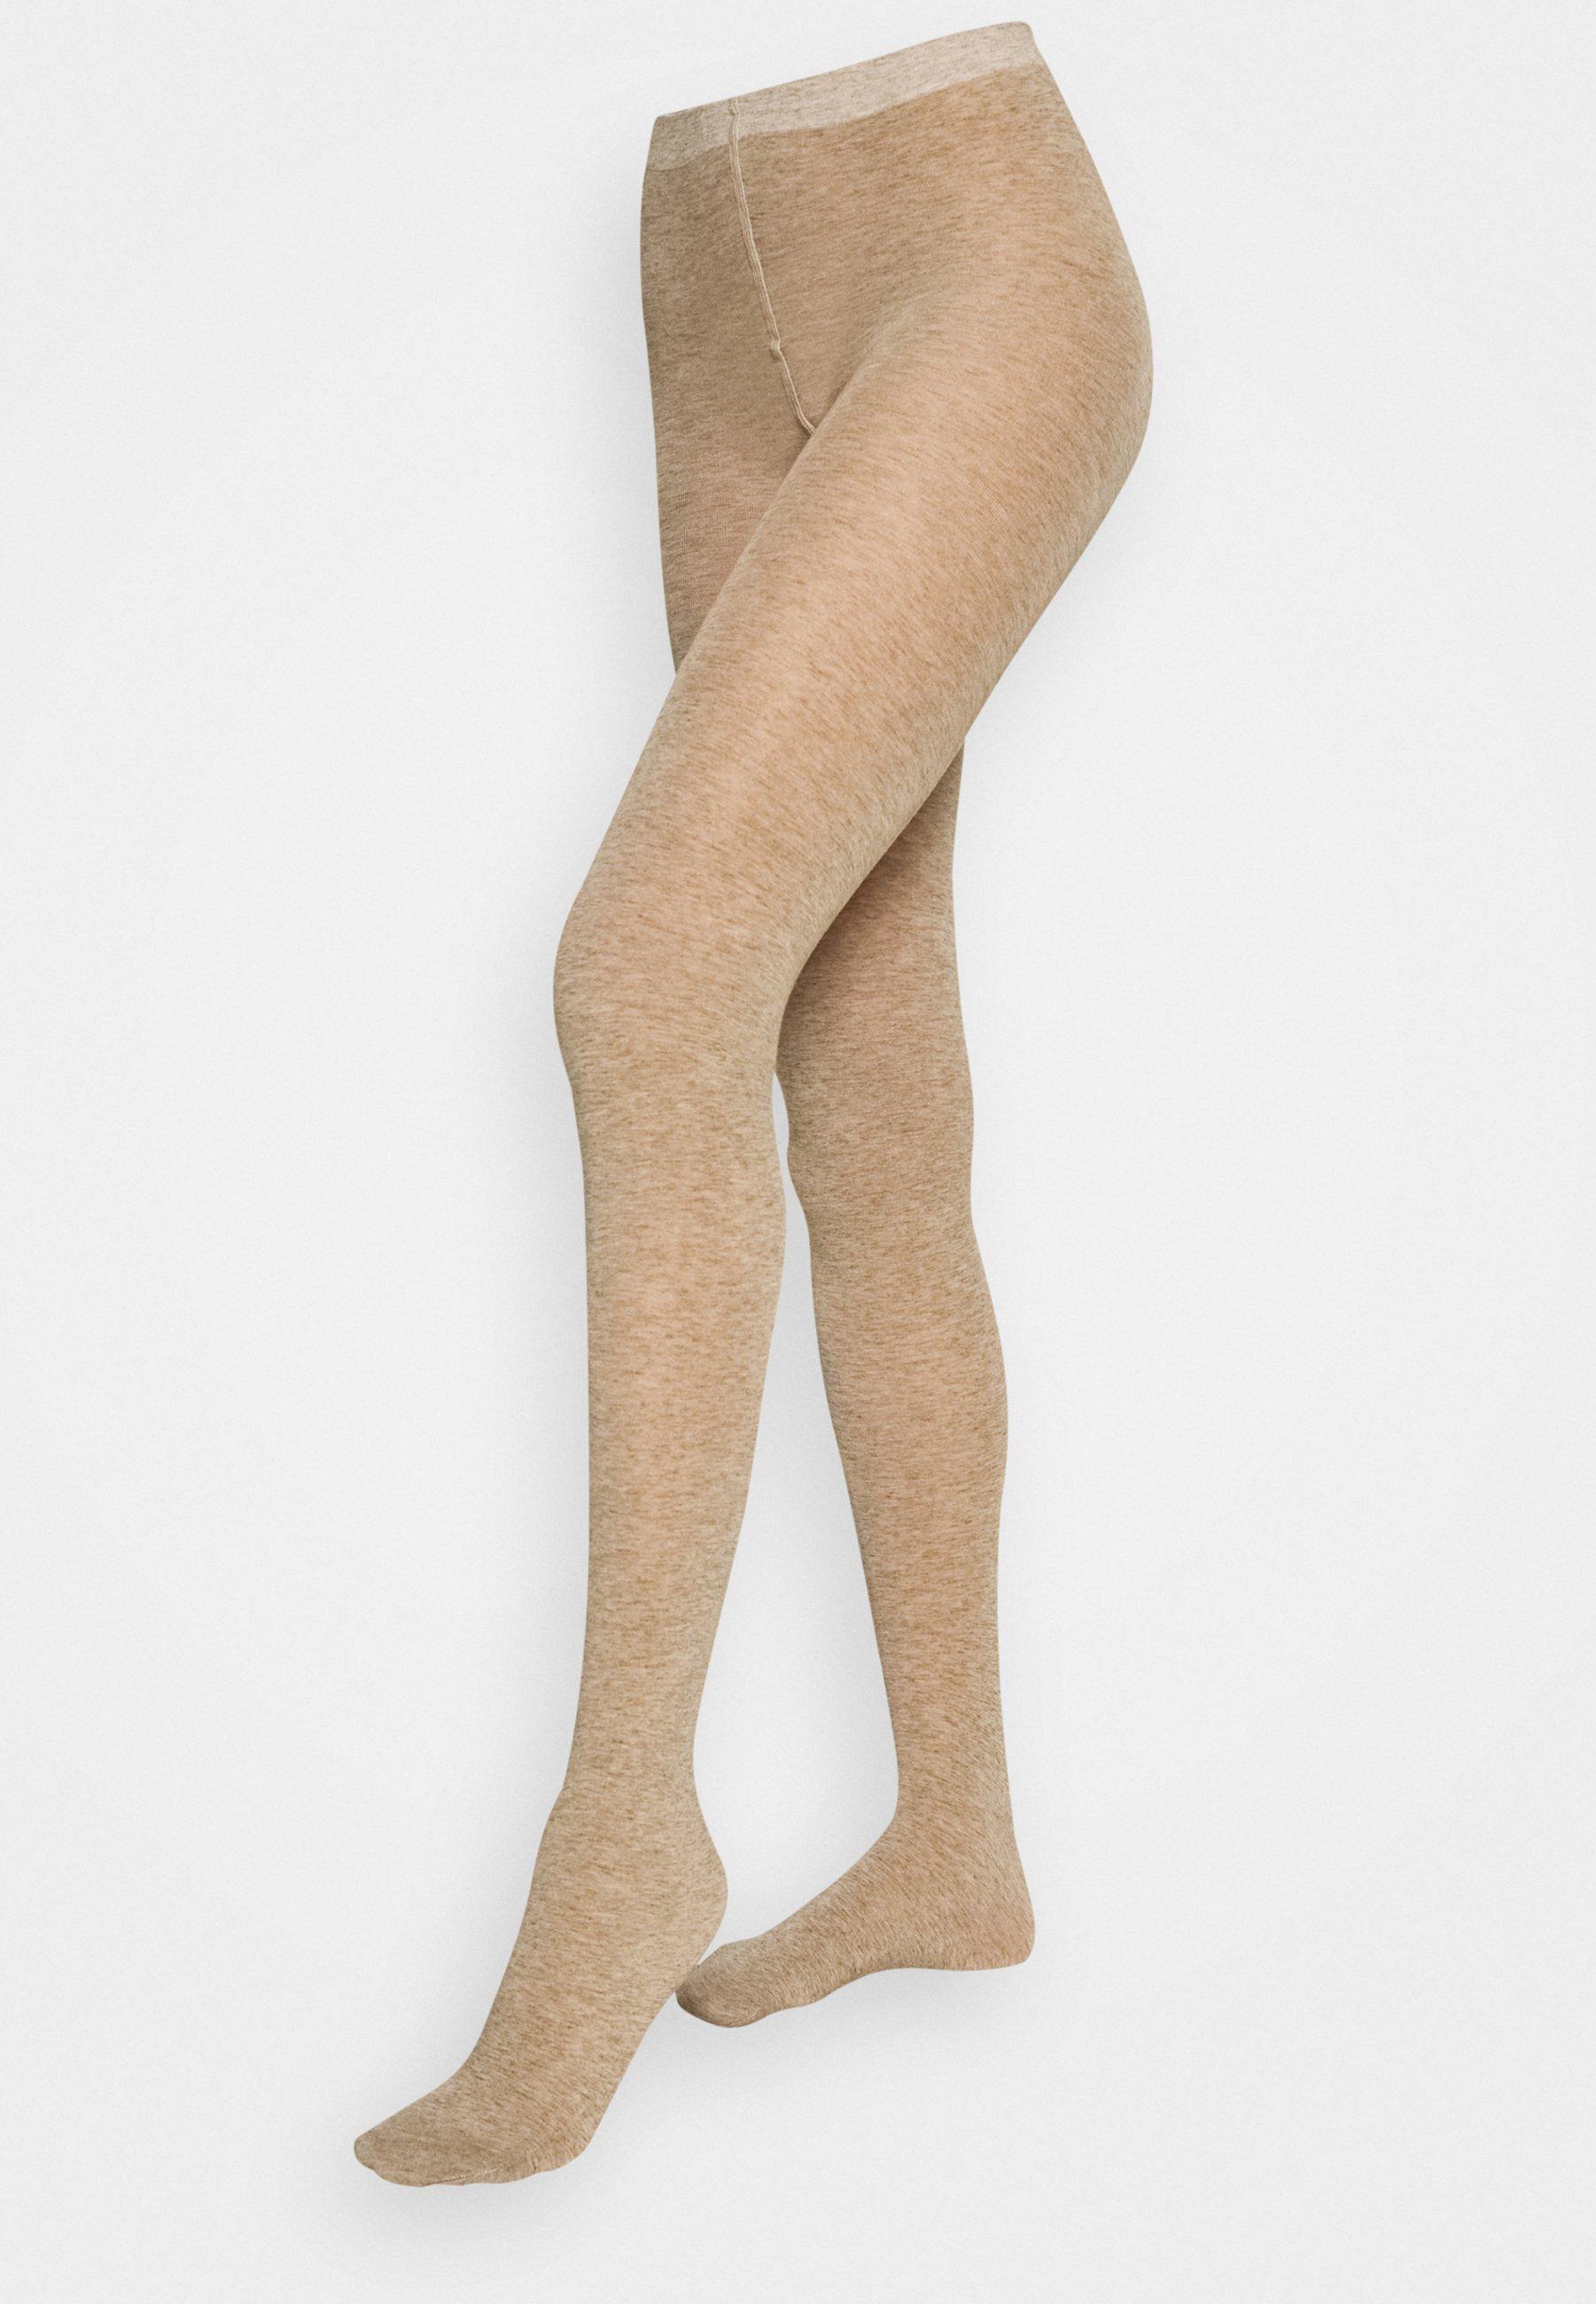 Femme SENSUAL CASHMERE 50 DENIER HALB-BLICKDICHT MATT - Collants